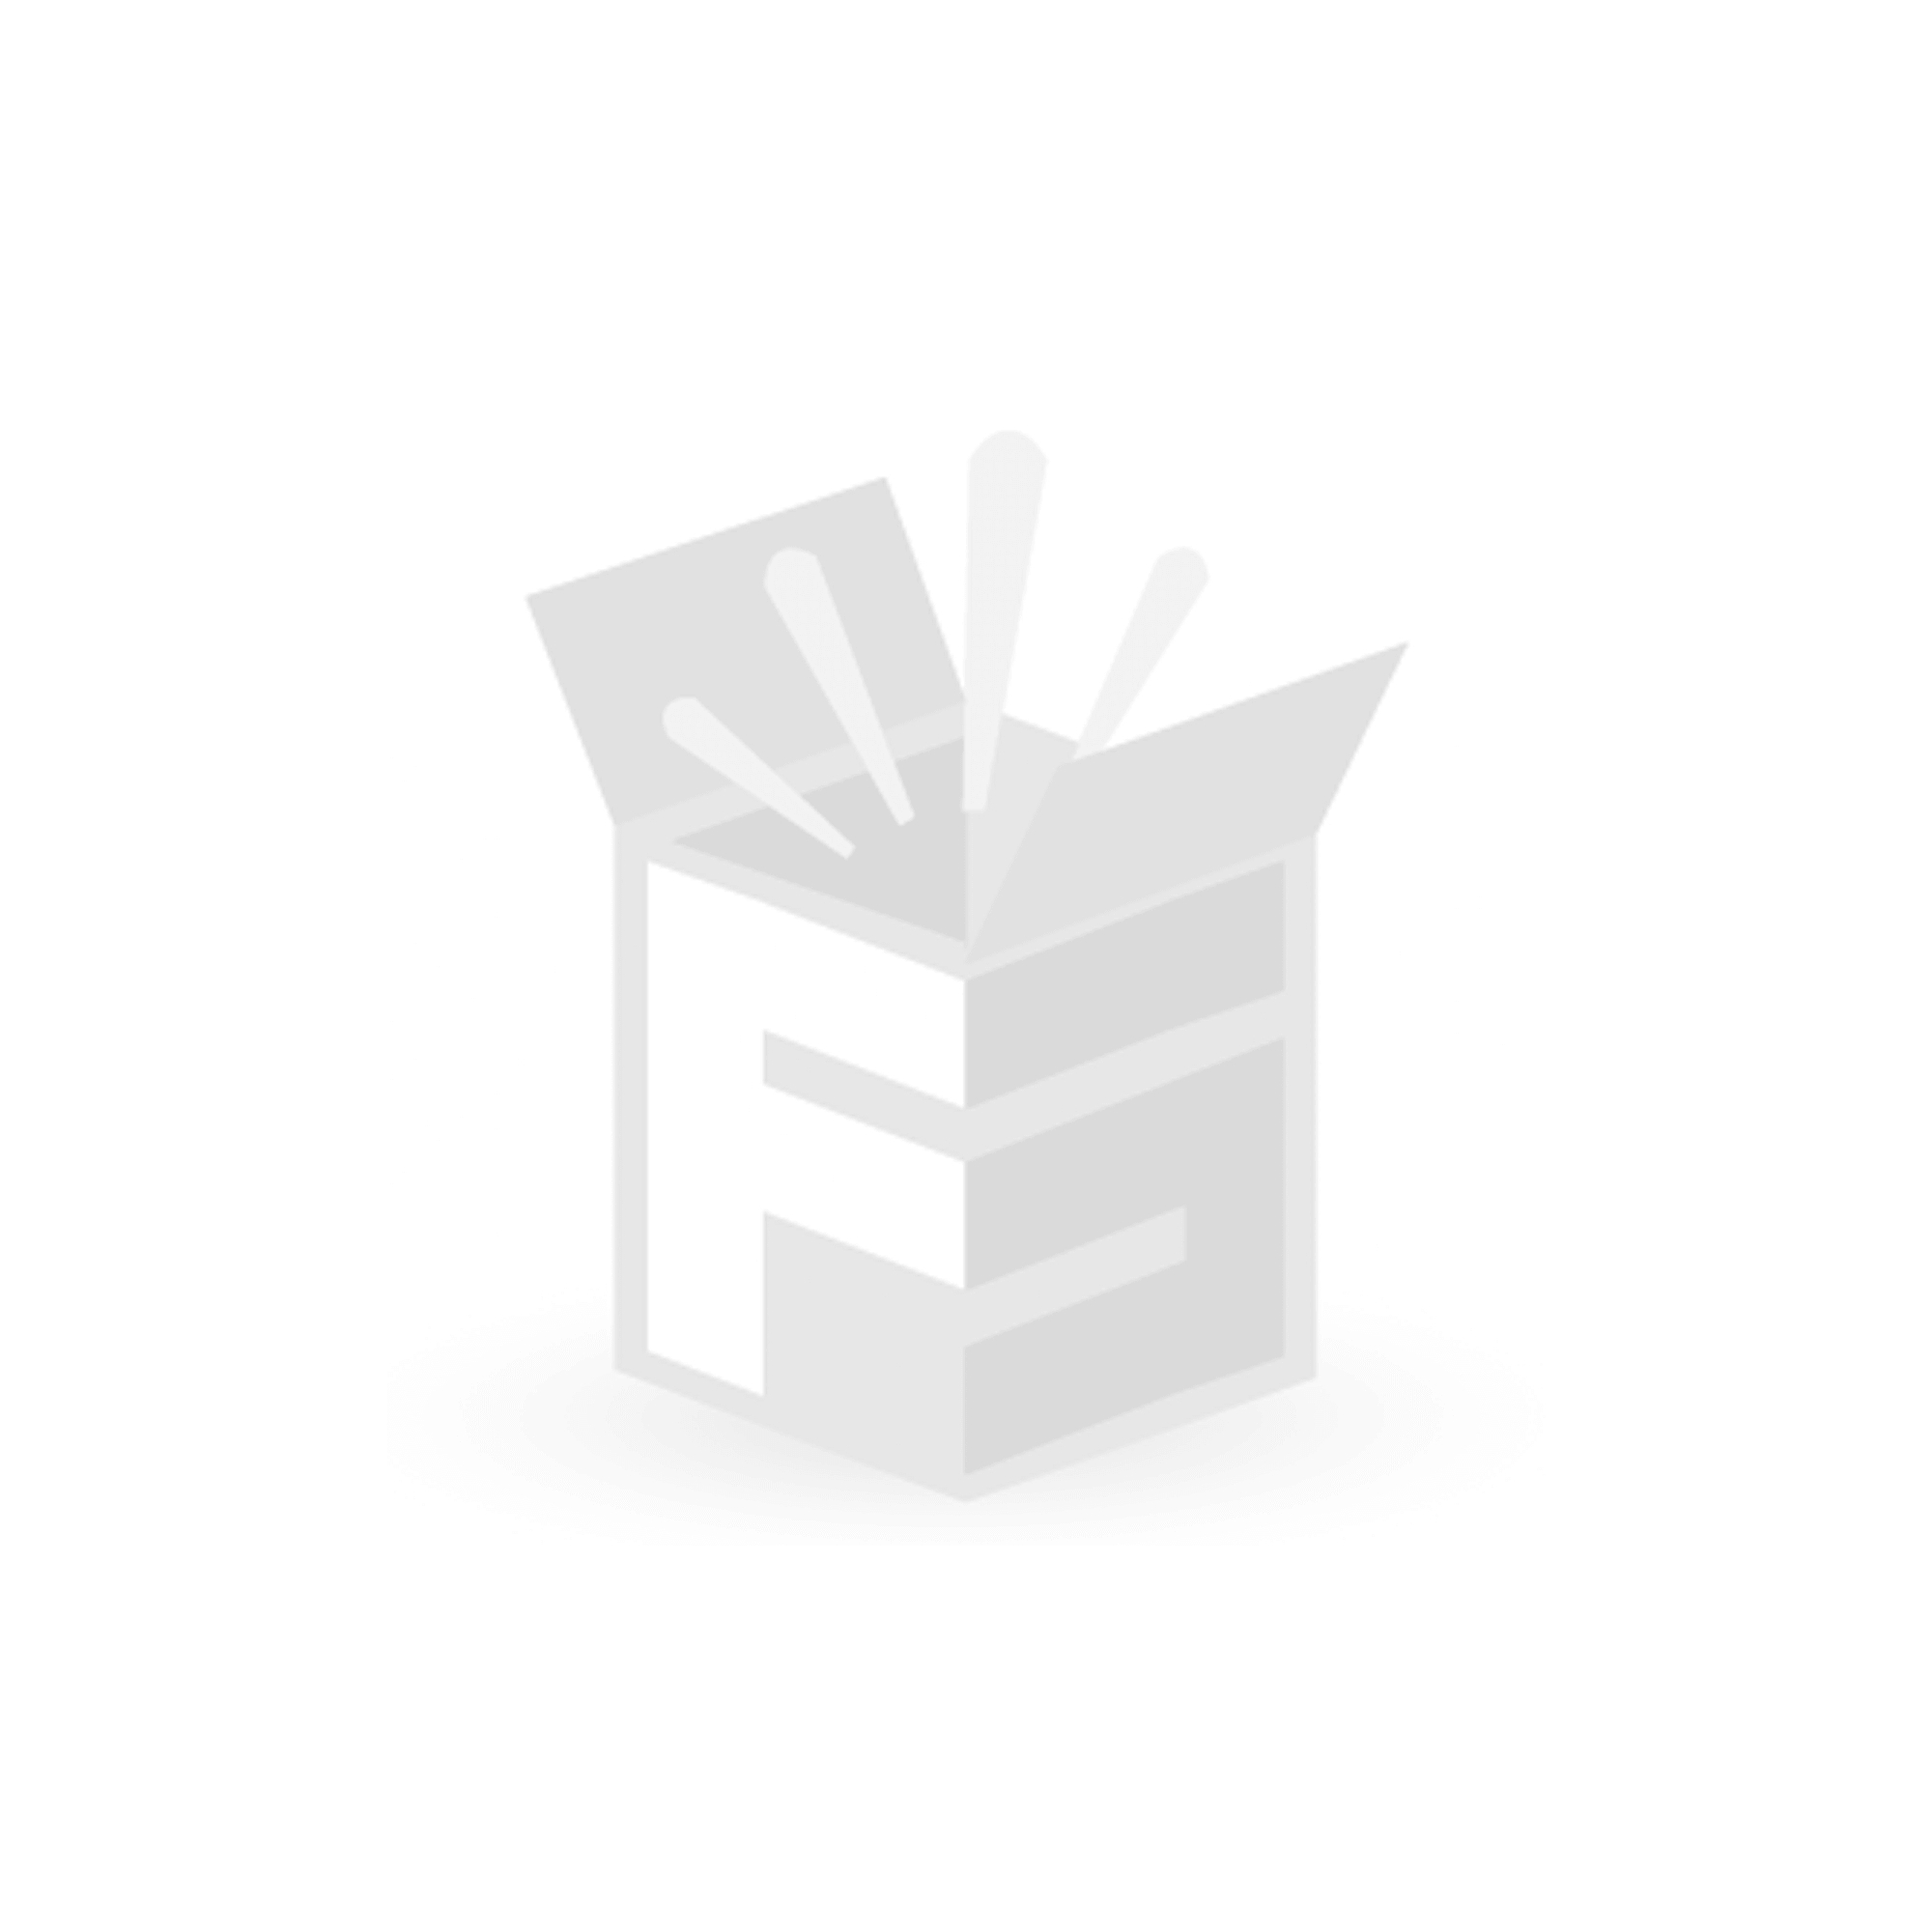 bosch bohrerset pro box hss pointteq 19 teilig bau do it. Black Bedroom Furniture Sets. Home Design Ideas